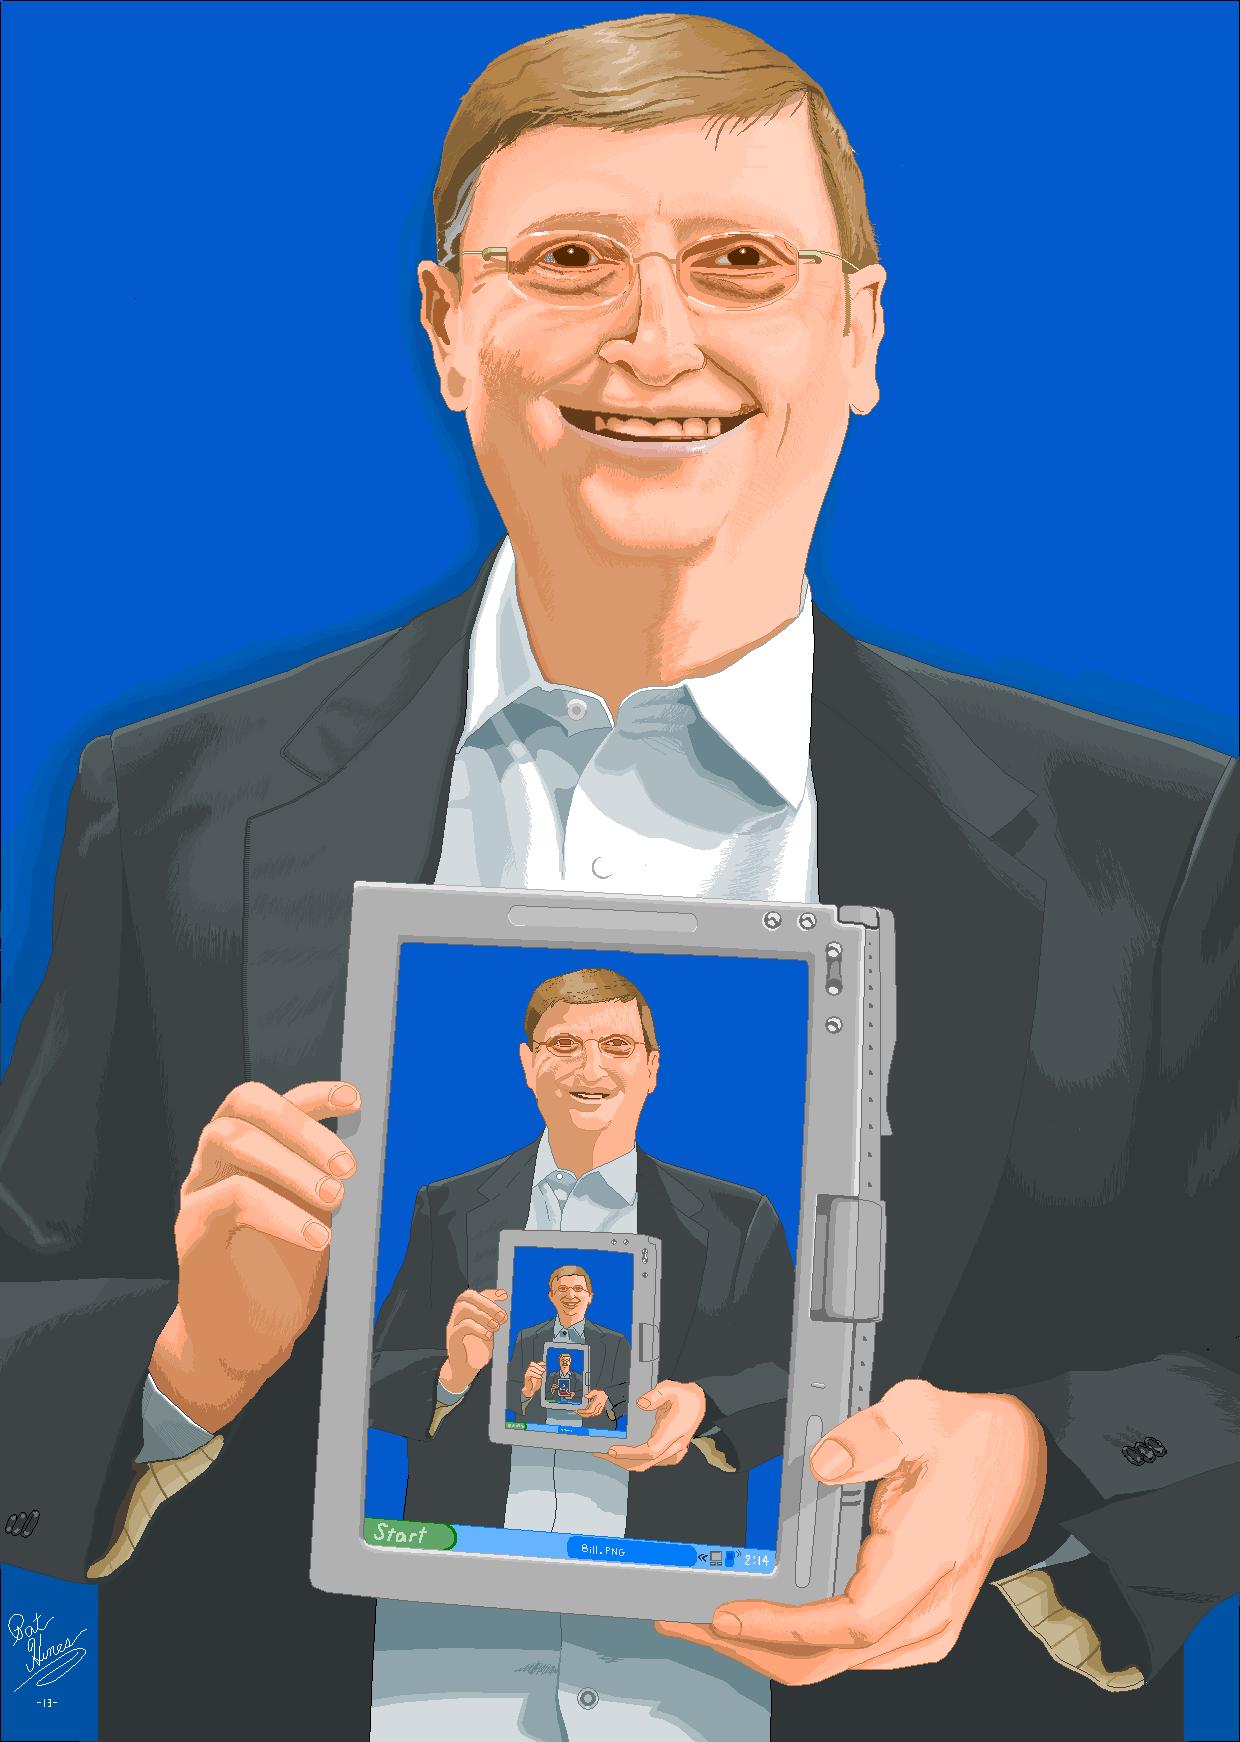 Bill Gates in Microsoft Paint